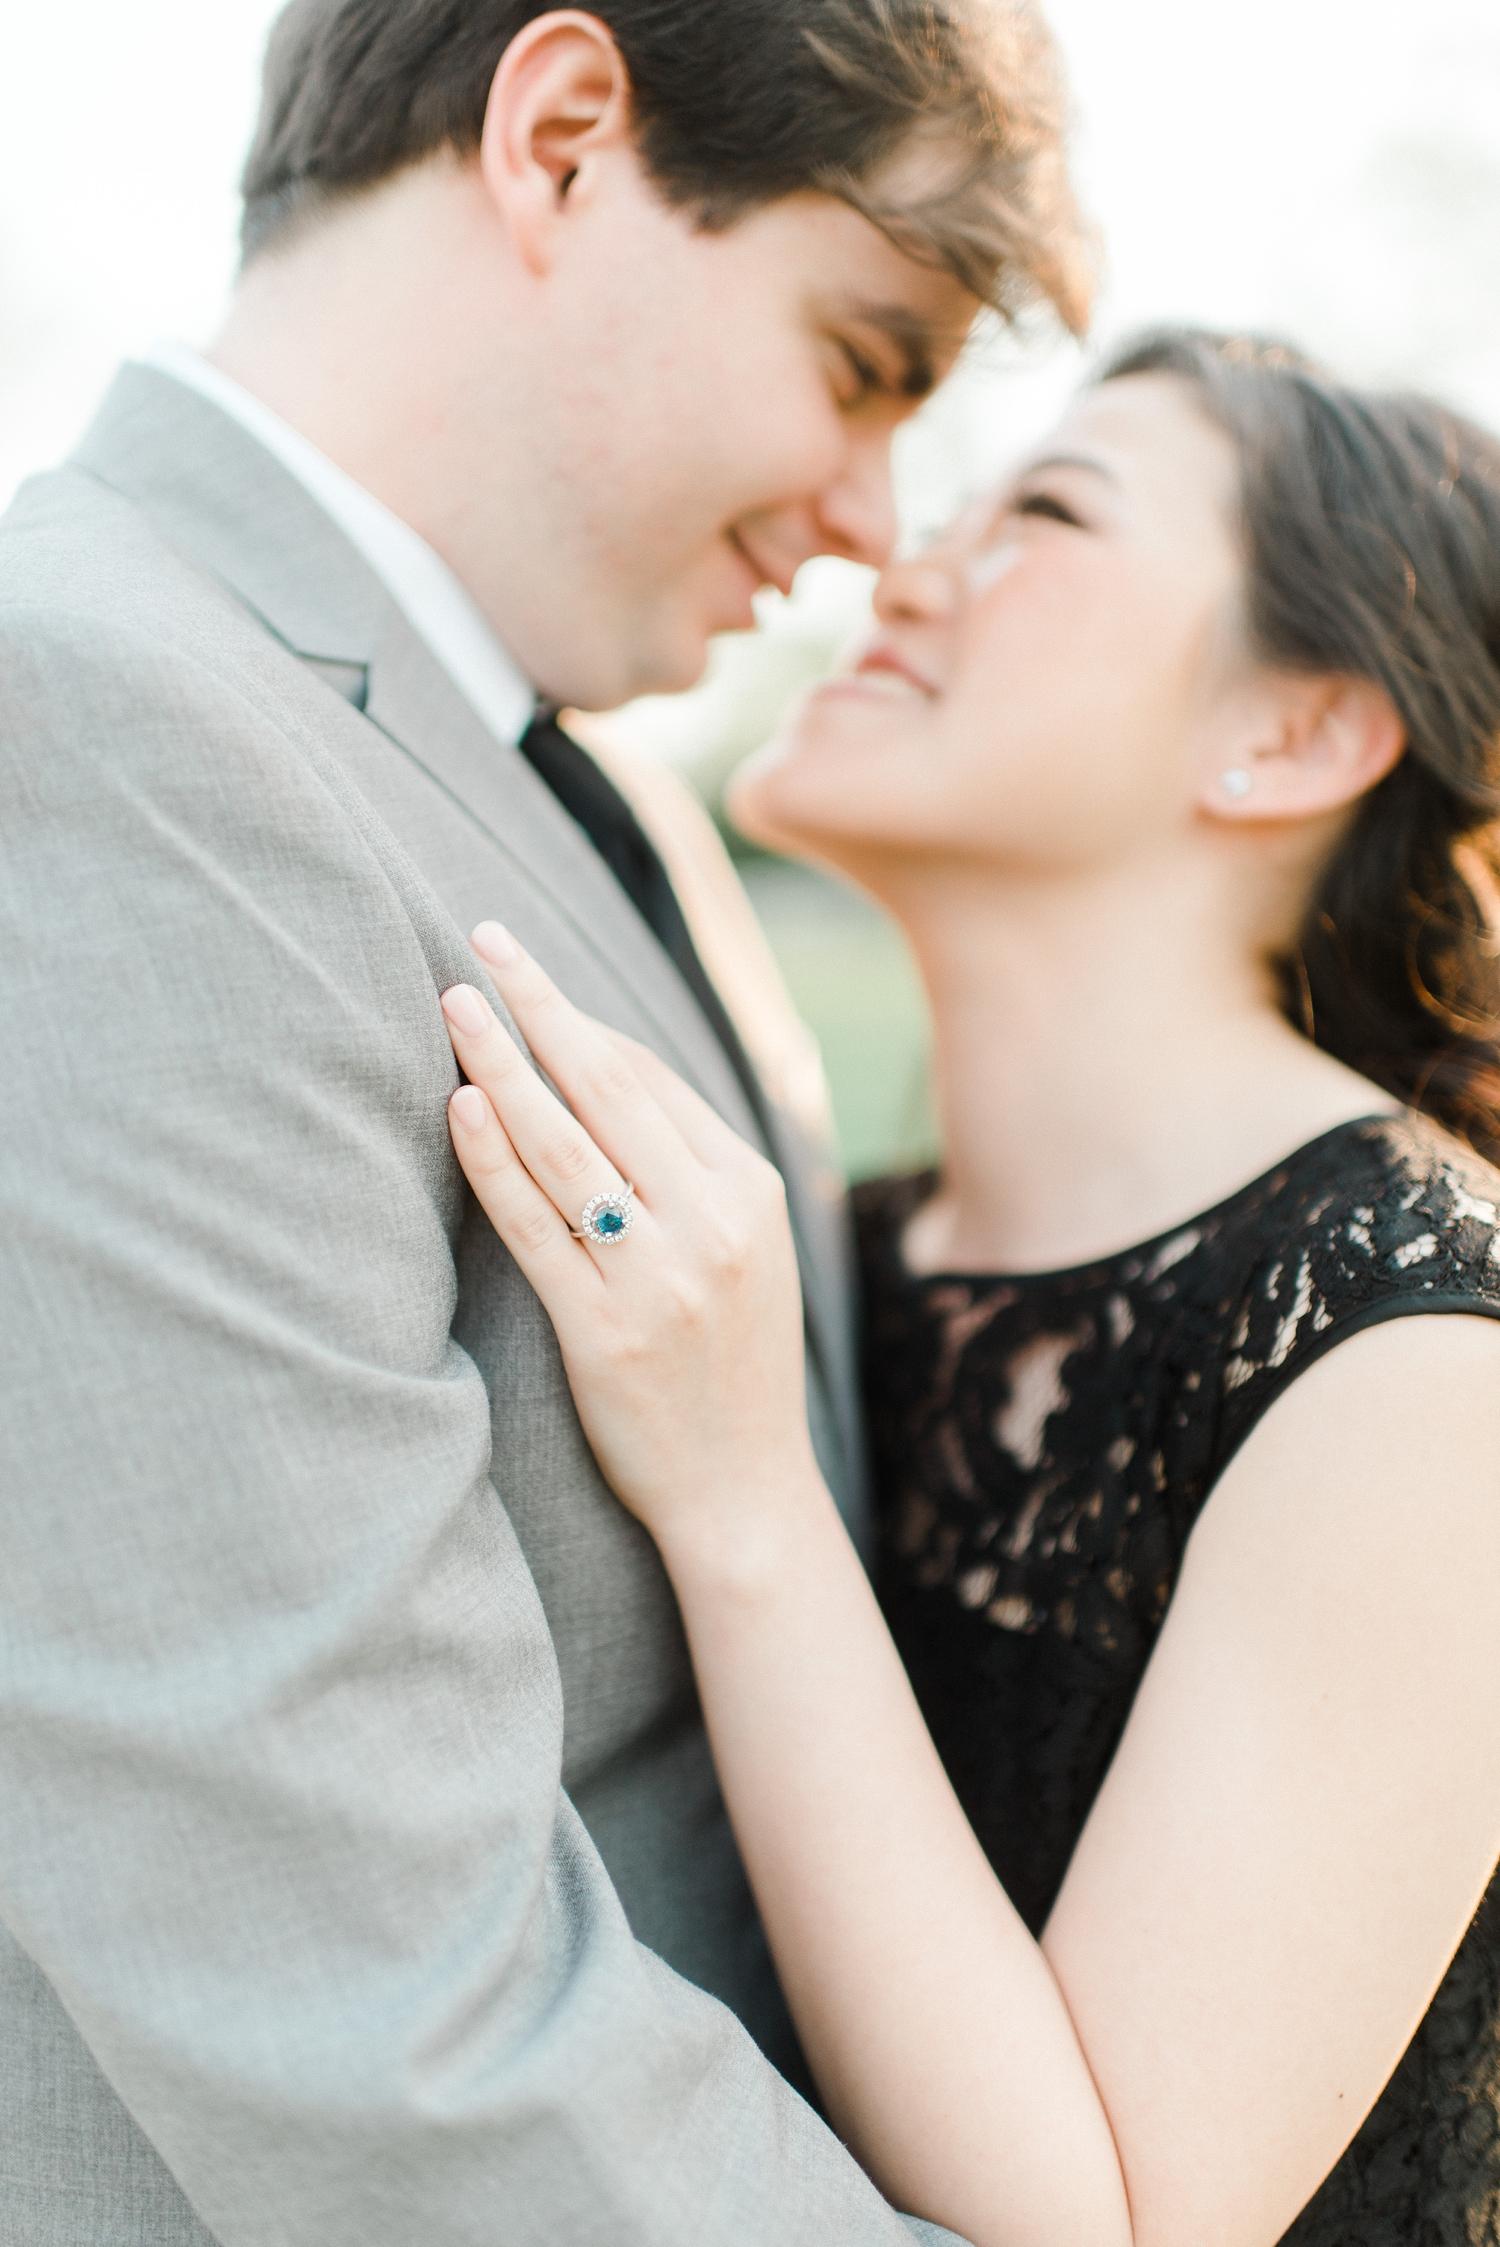 ash_lawn_charlottesville_couples_portraits_0001.jpg